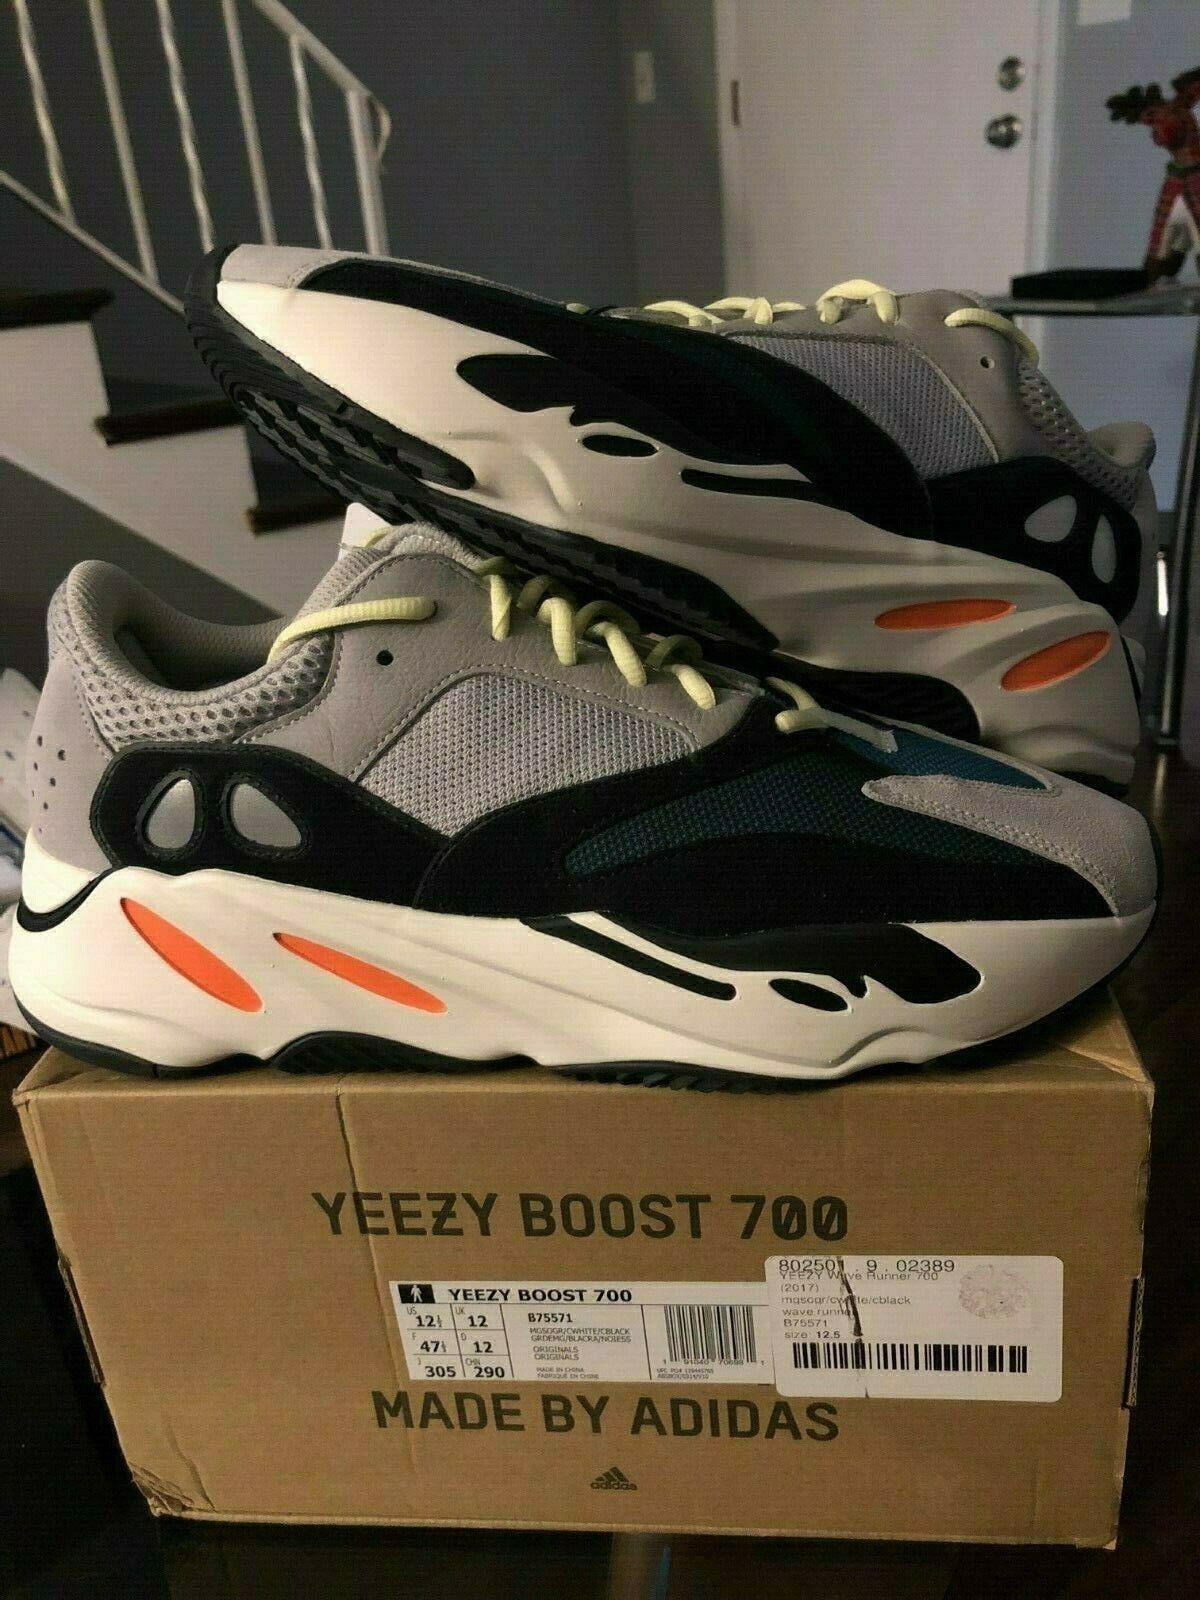 Adidas Yeezy Boost 700 Waverunner Solid Grey B75571 BRAND NEW mismatch size READ